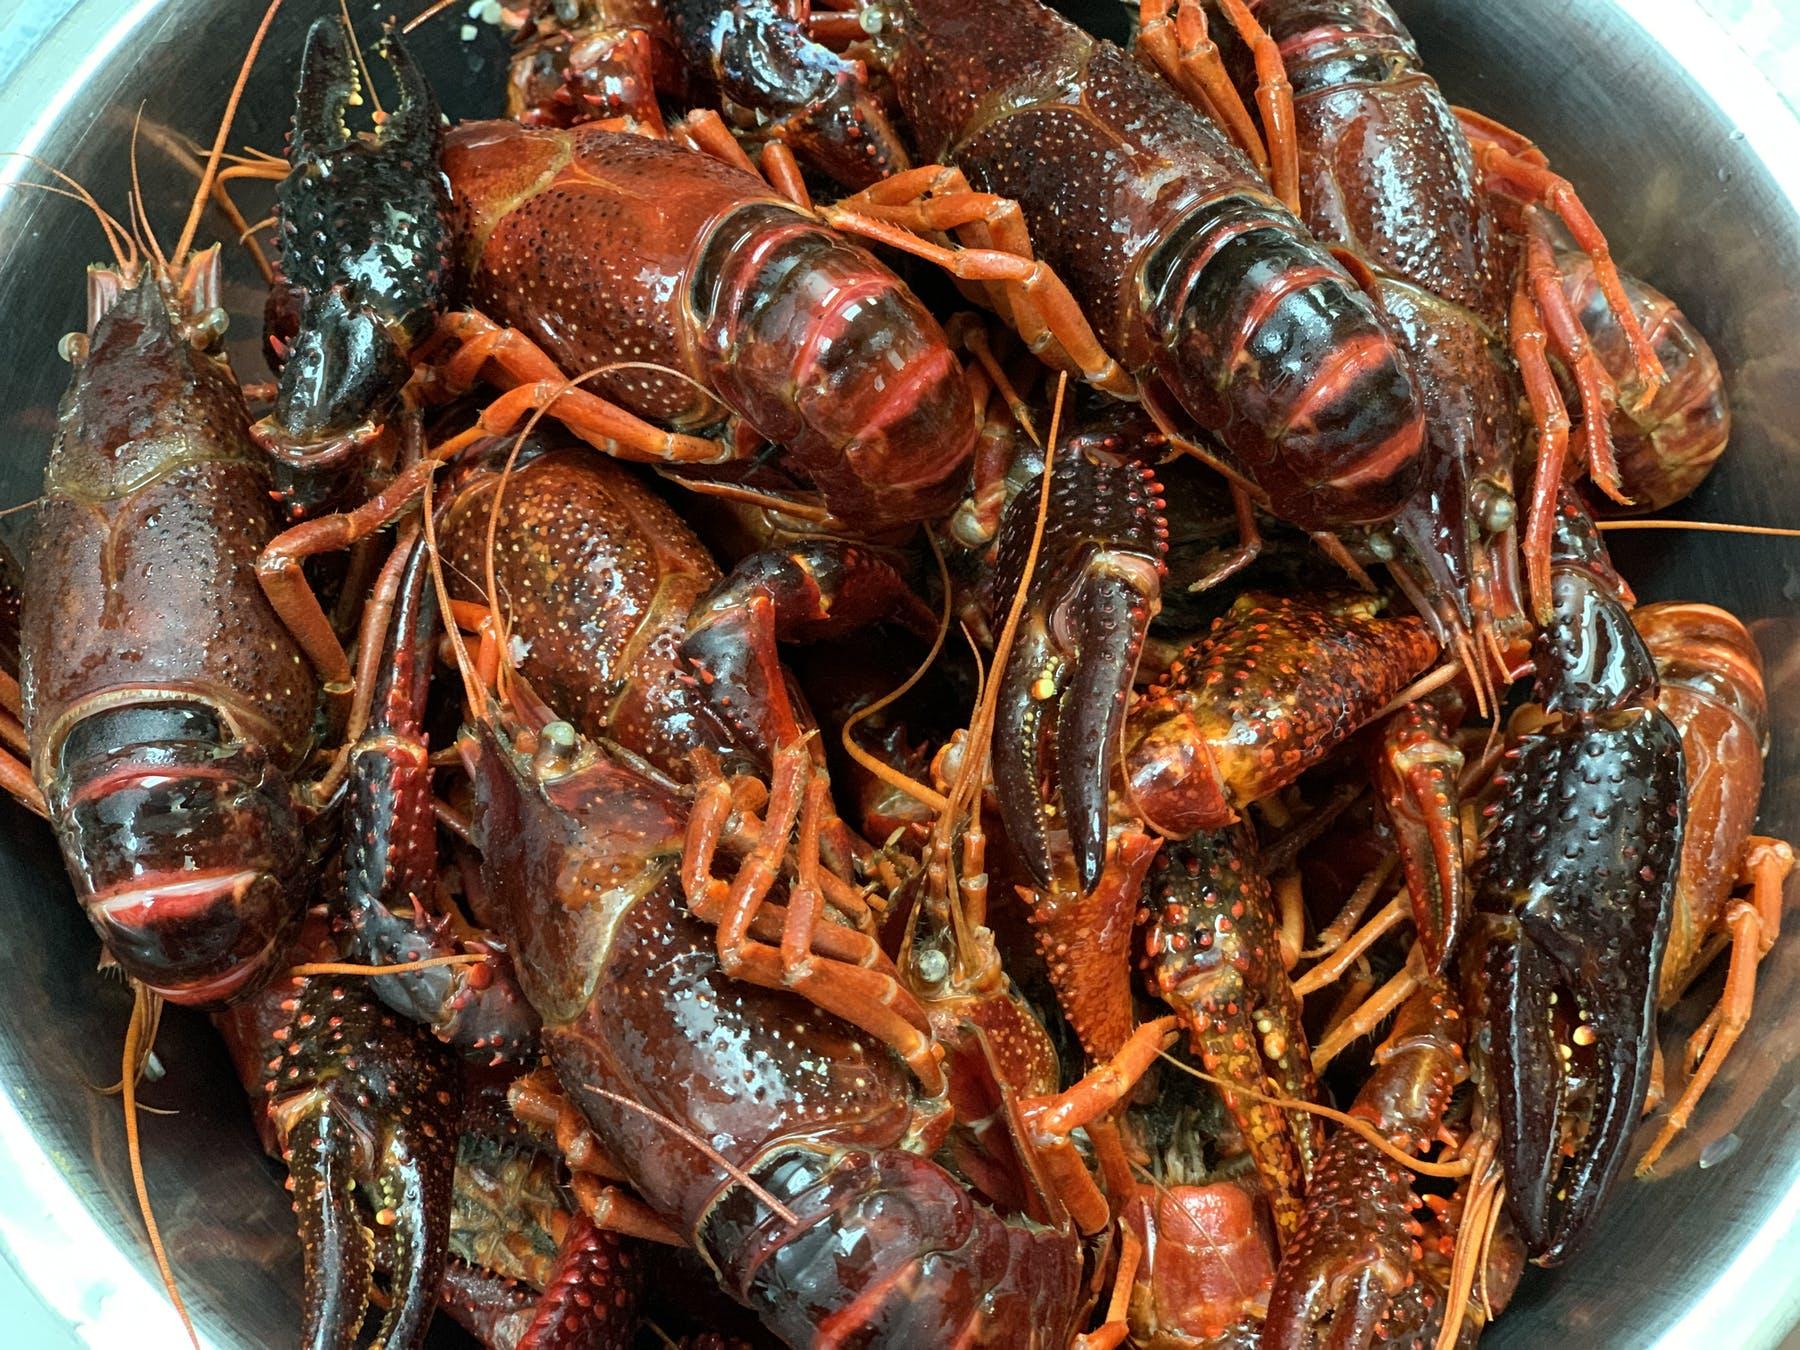 live crawfish in bowl